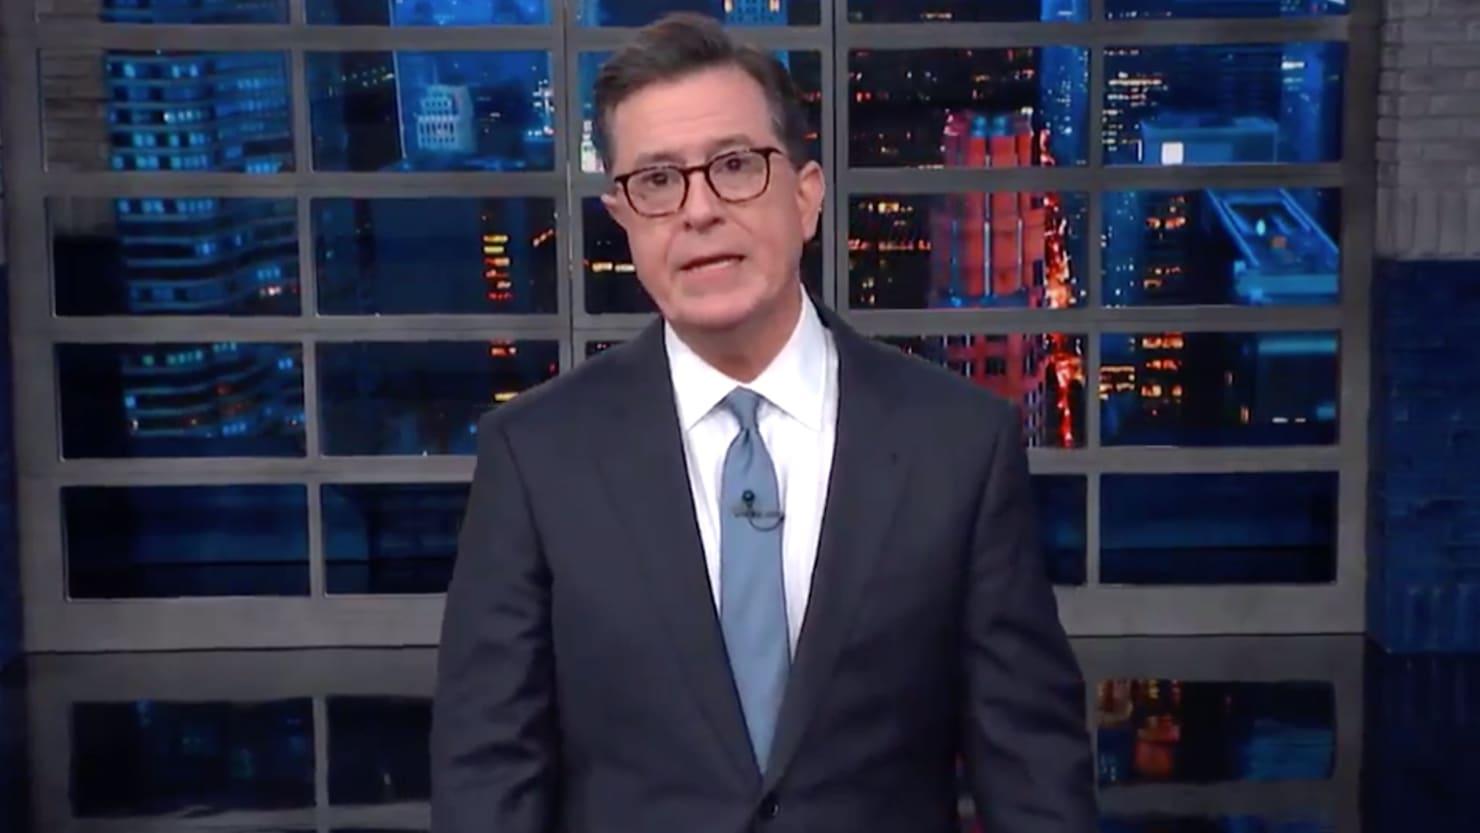 Colbert Slams Trump's 'Silence' on Coast Guard Terrorist